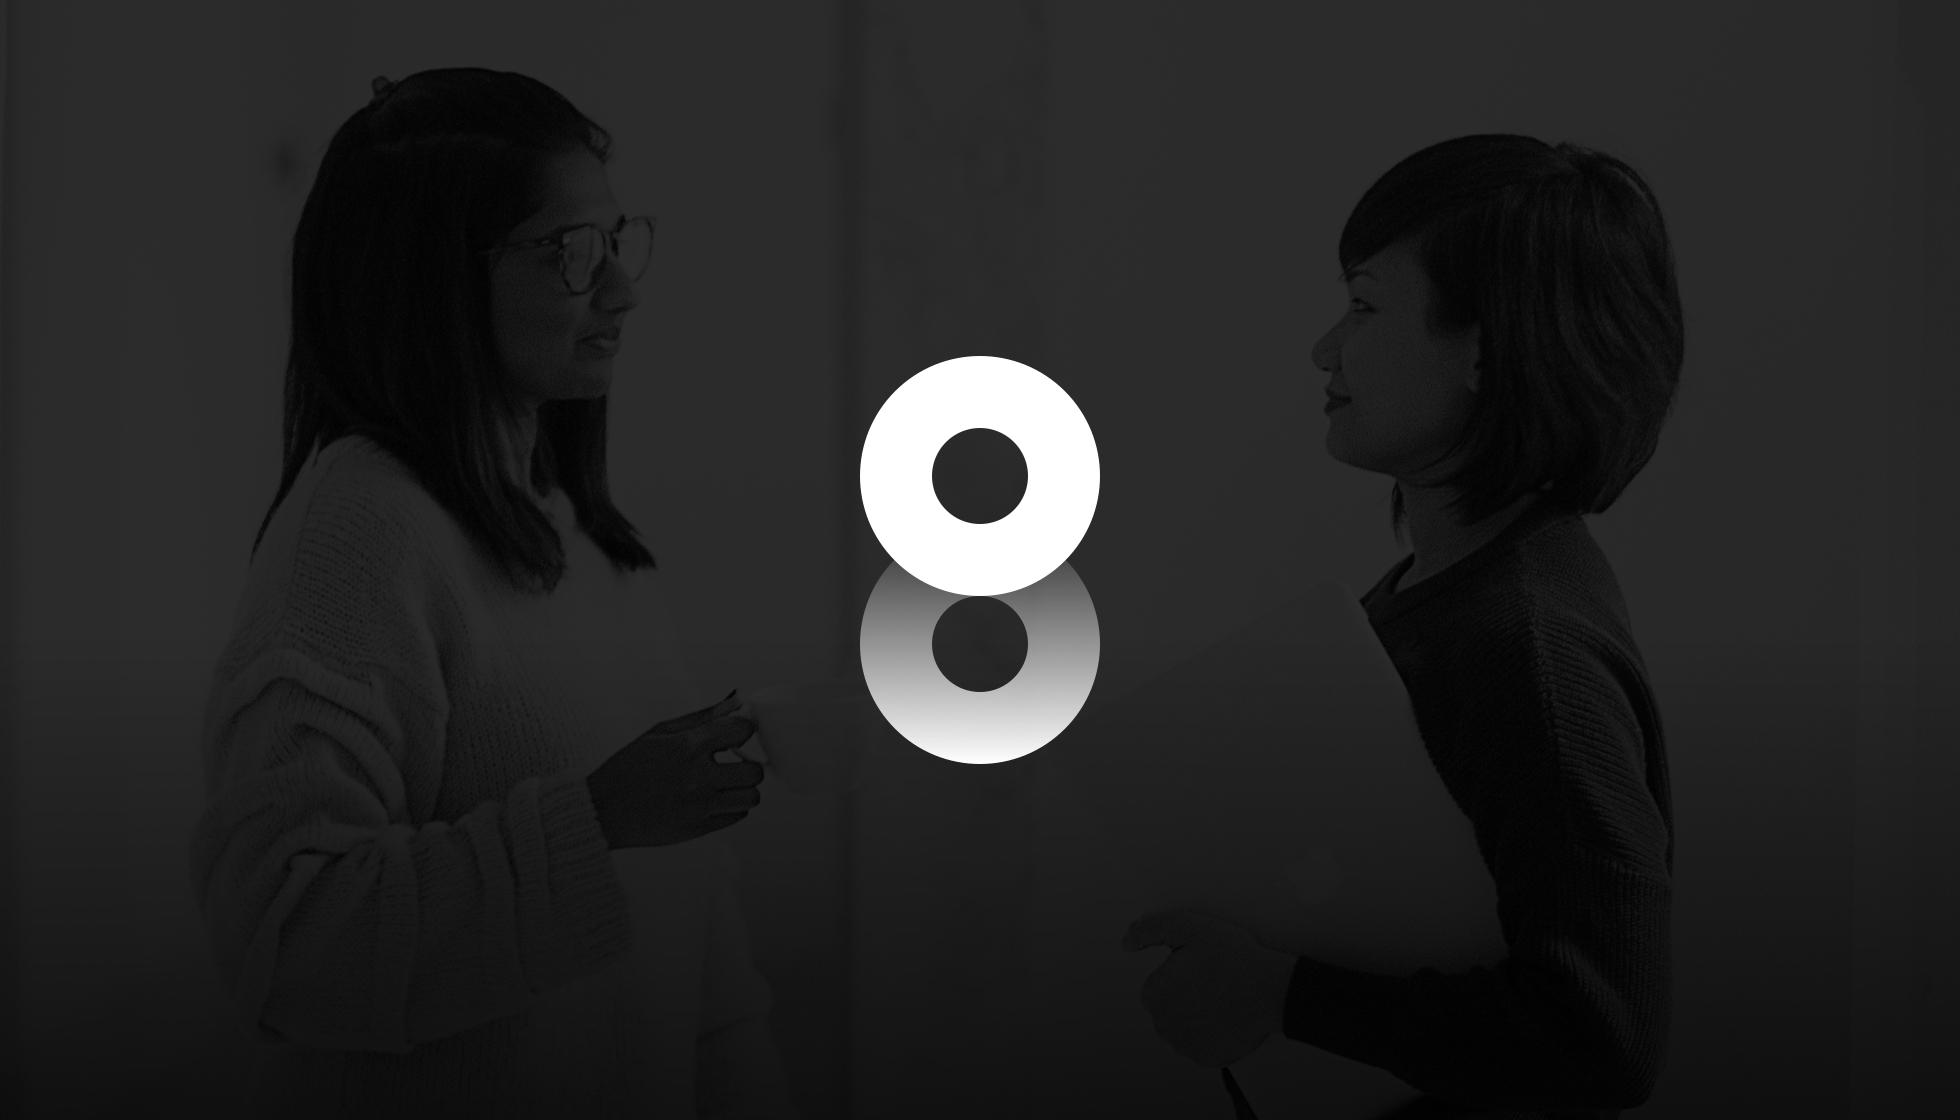 8 design principles